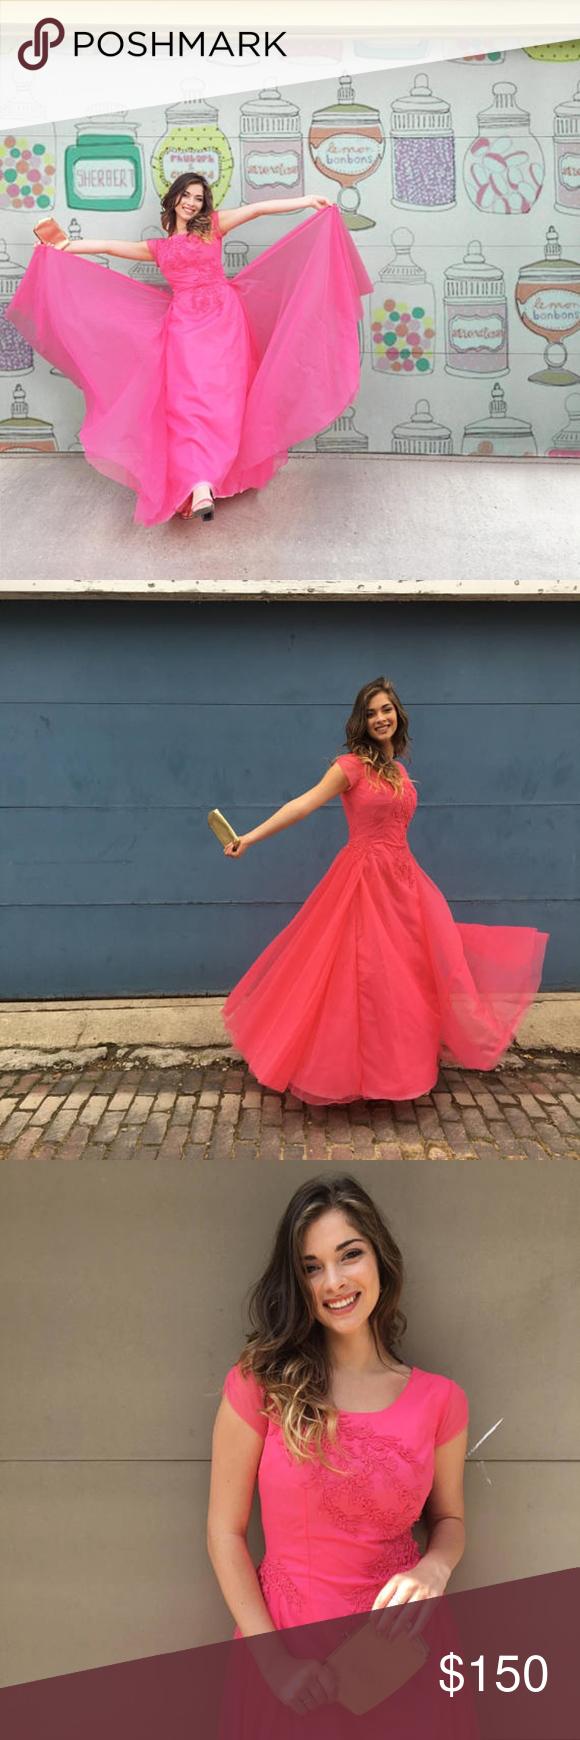 Vintage us fluffy pink prom dress in my posh picks